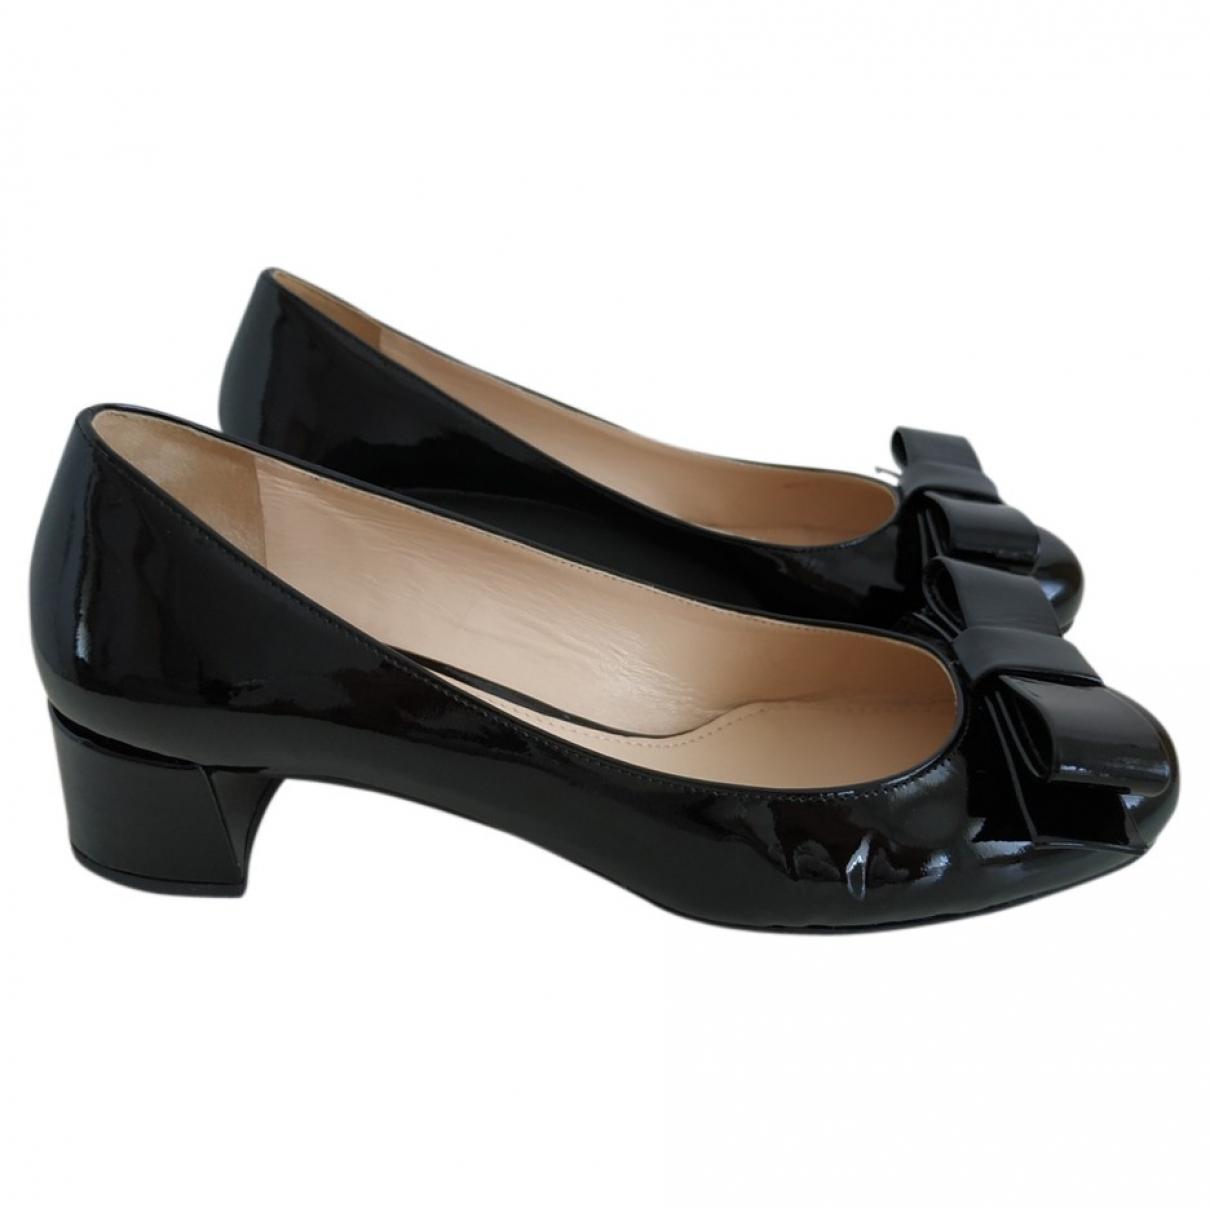 Prada \N Black Patent leather Heels for Women 36.5 EU